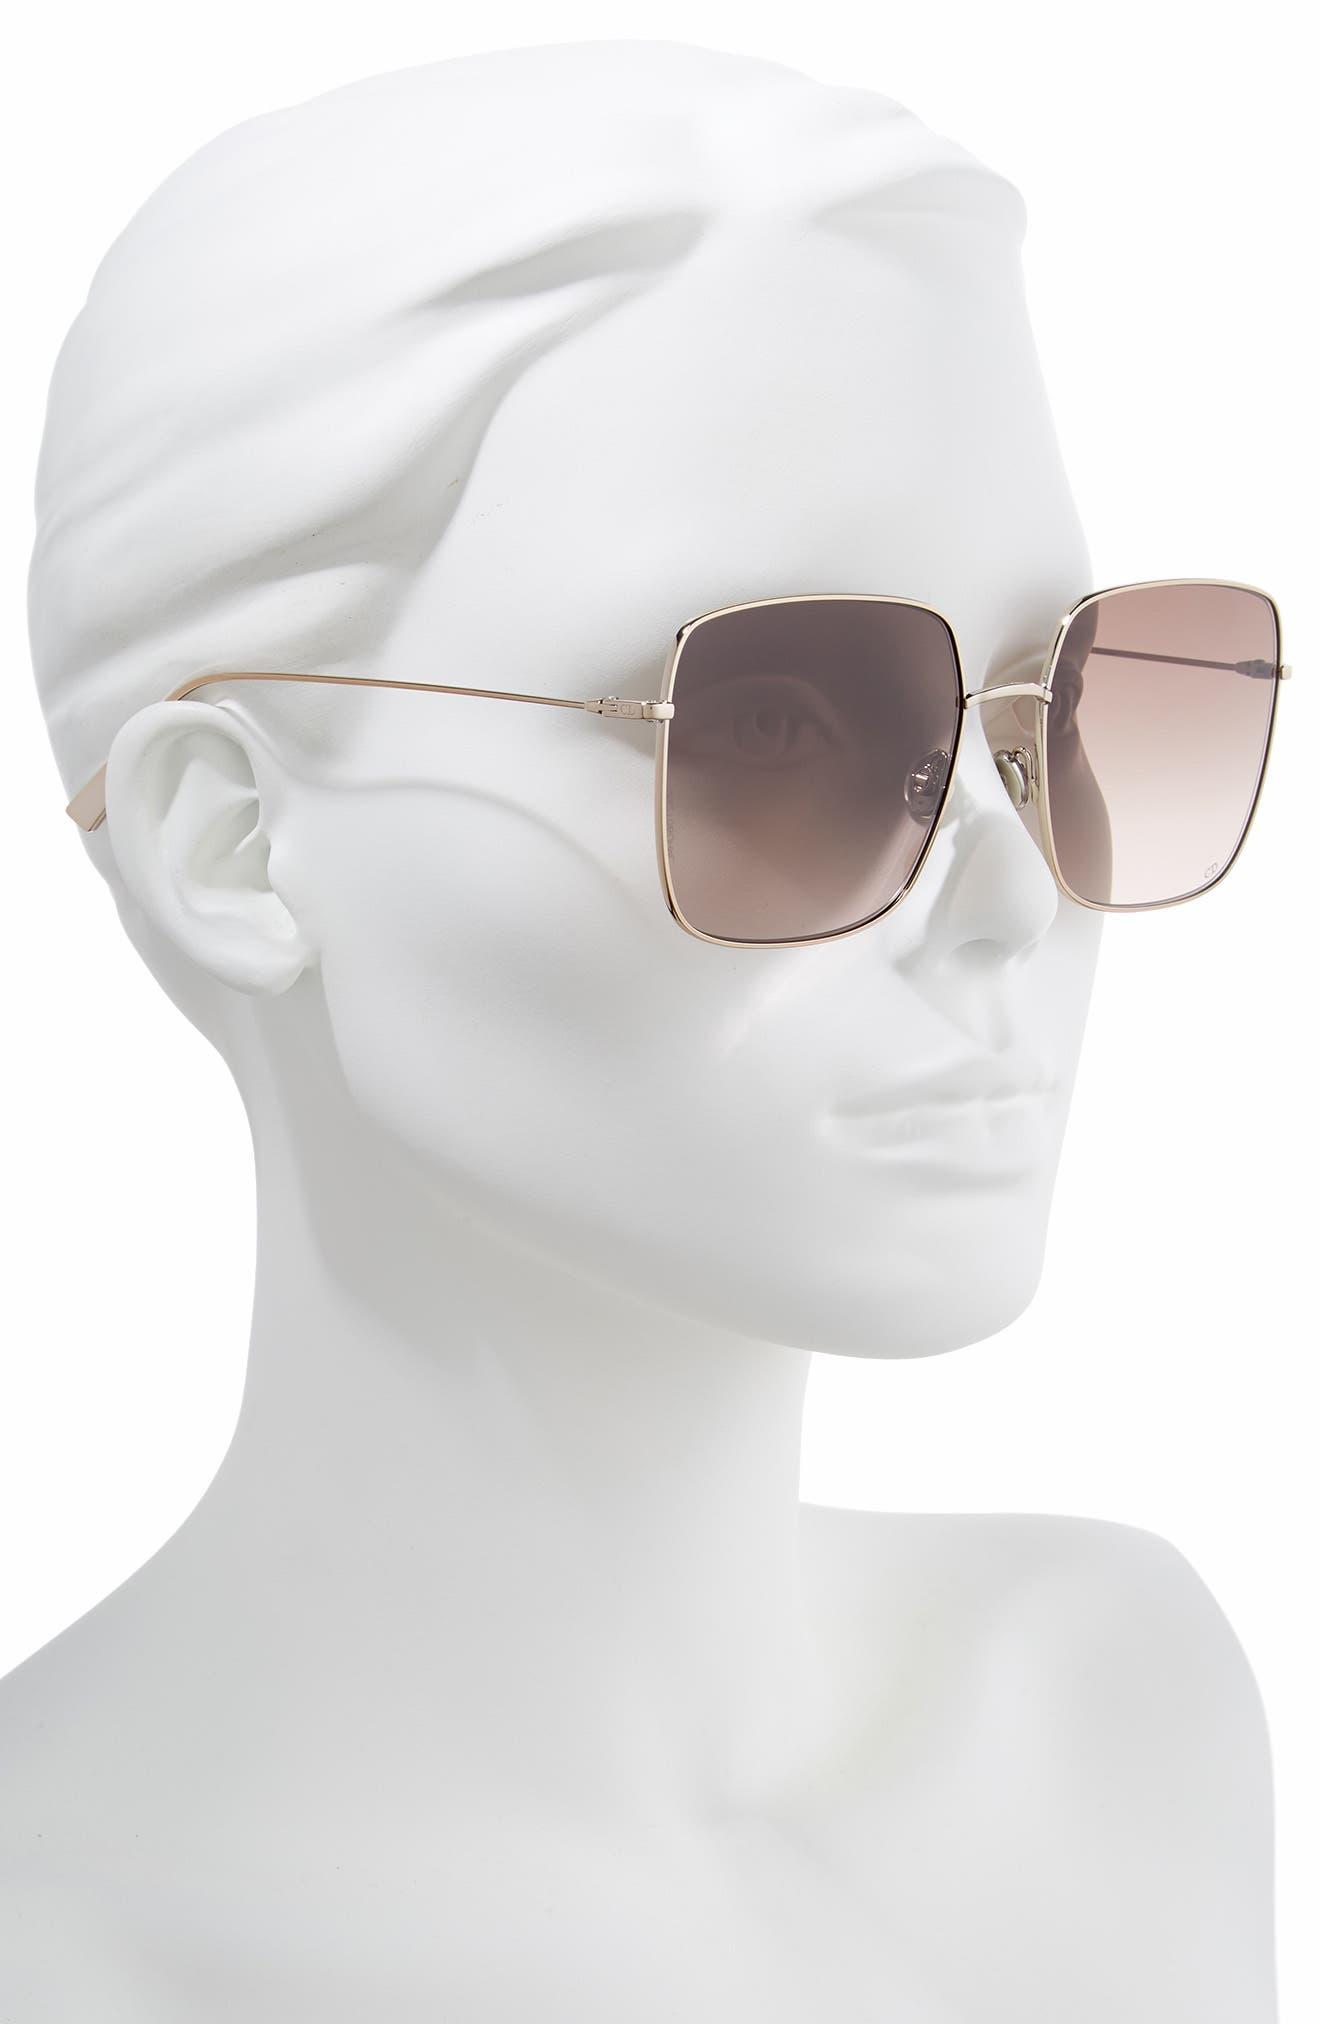 Stellaire 59mm Square Sunglasses,                             Alternate thumbnail 2, color,                             CHAMPAGNE